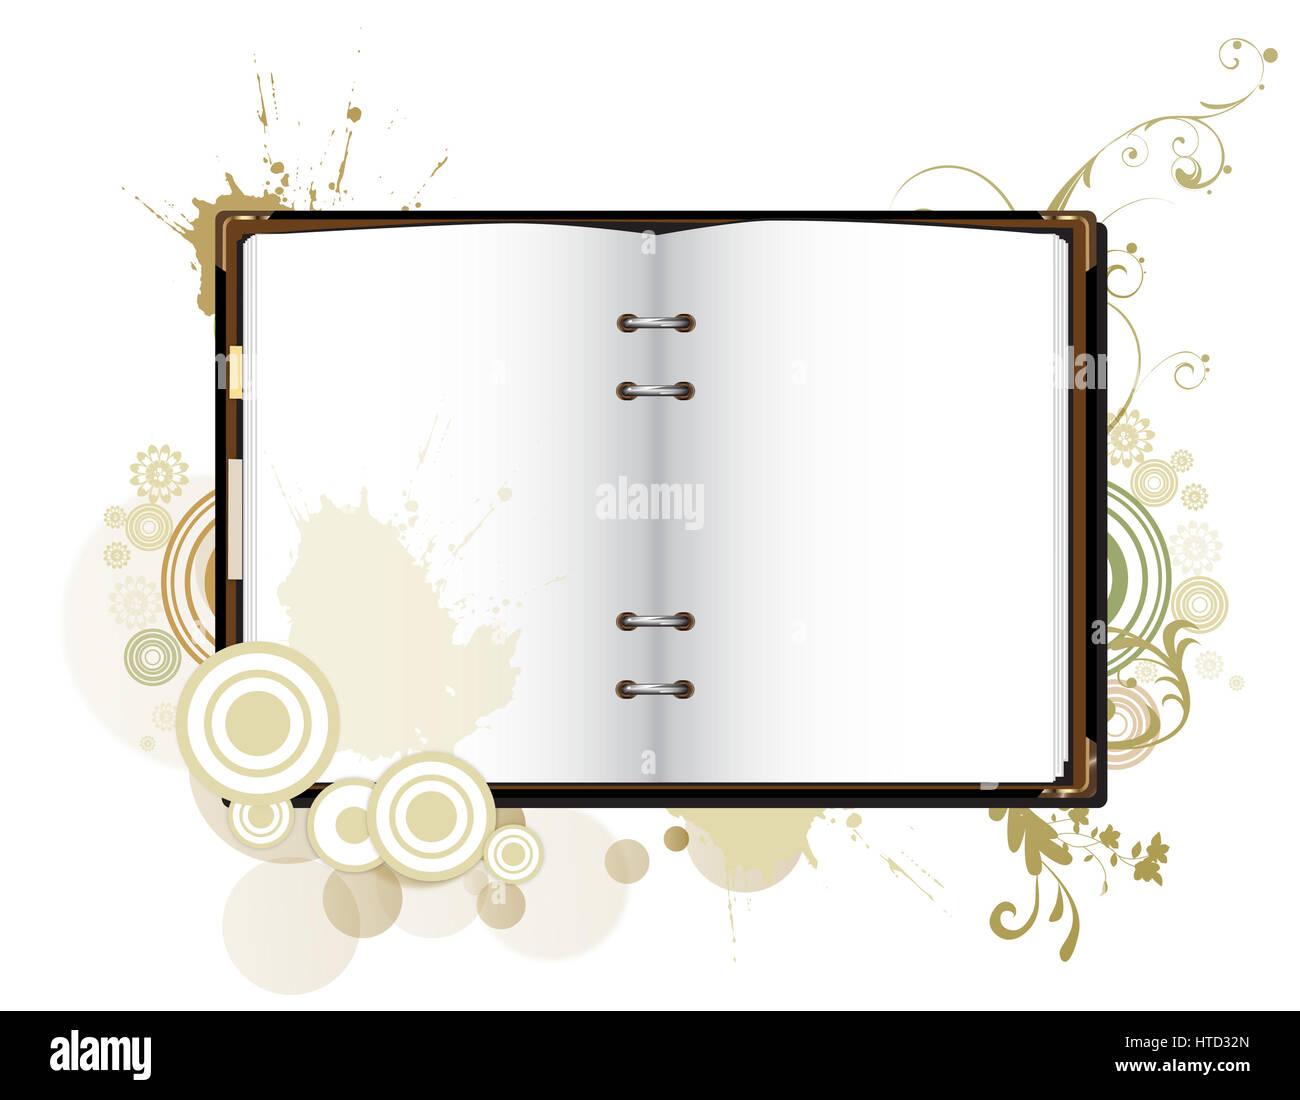 Attractive Sidelights Rhythm 2 Stock Photo: 135512125 - Alamy